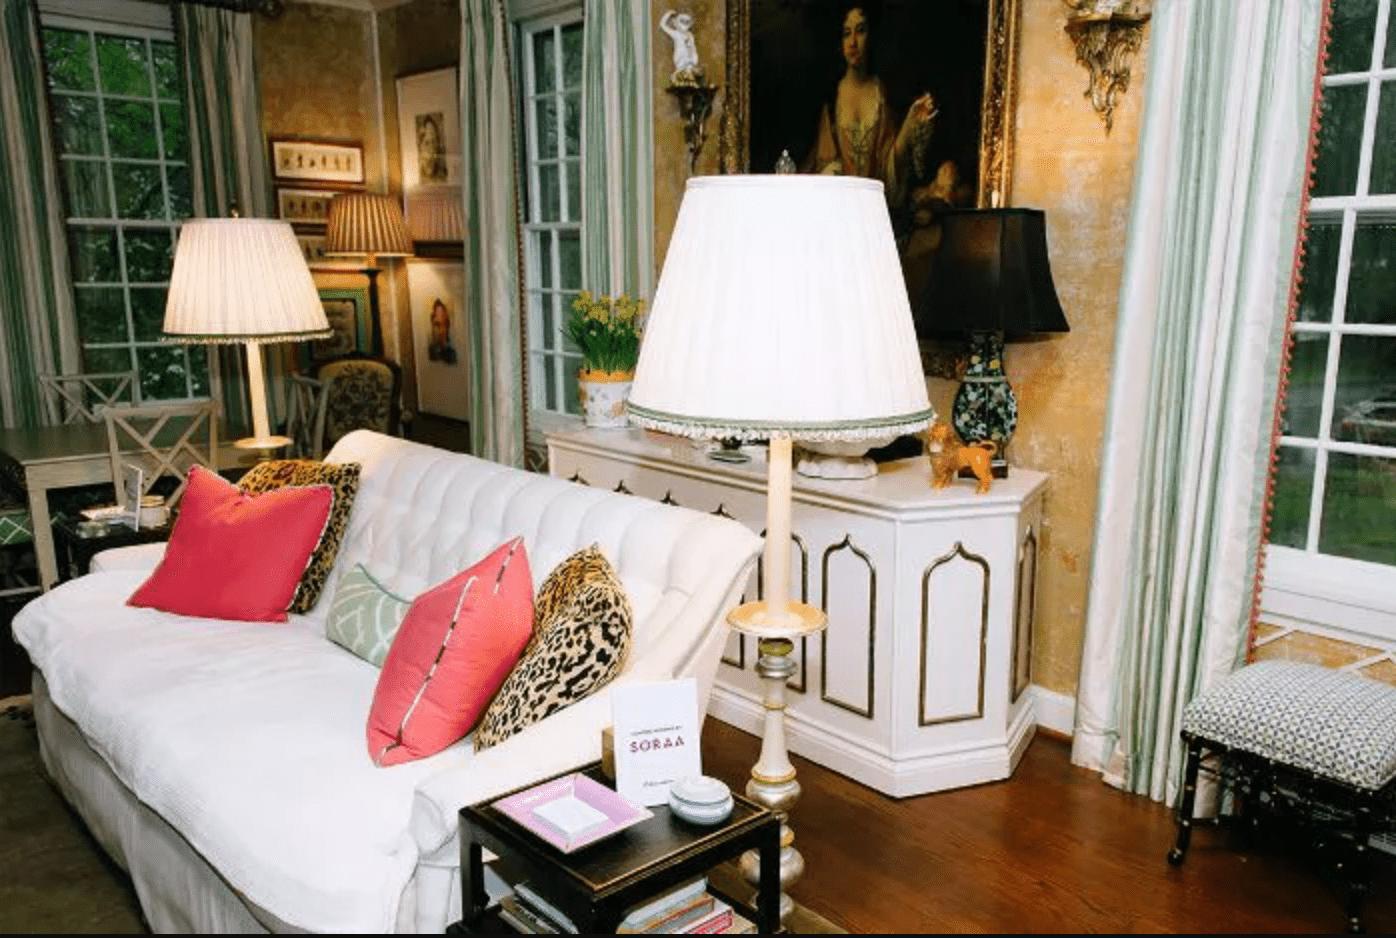 Living room with layered lighting